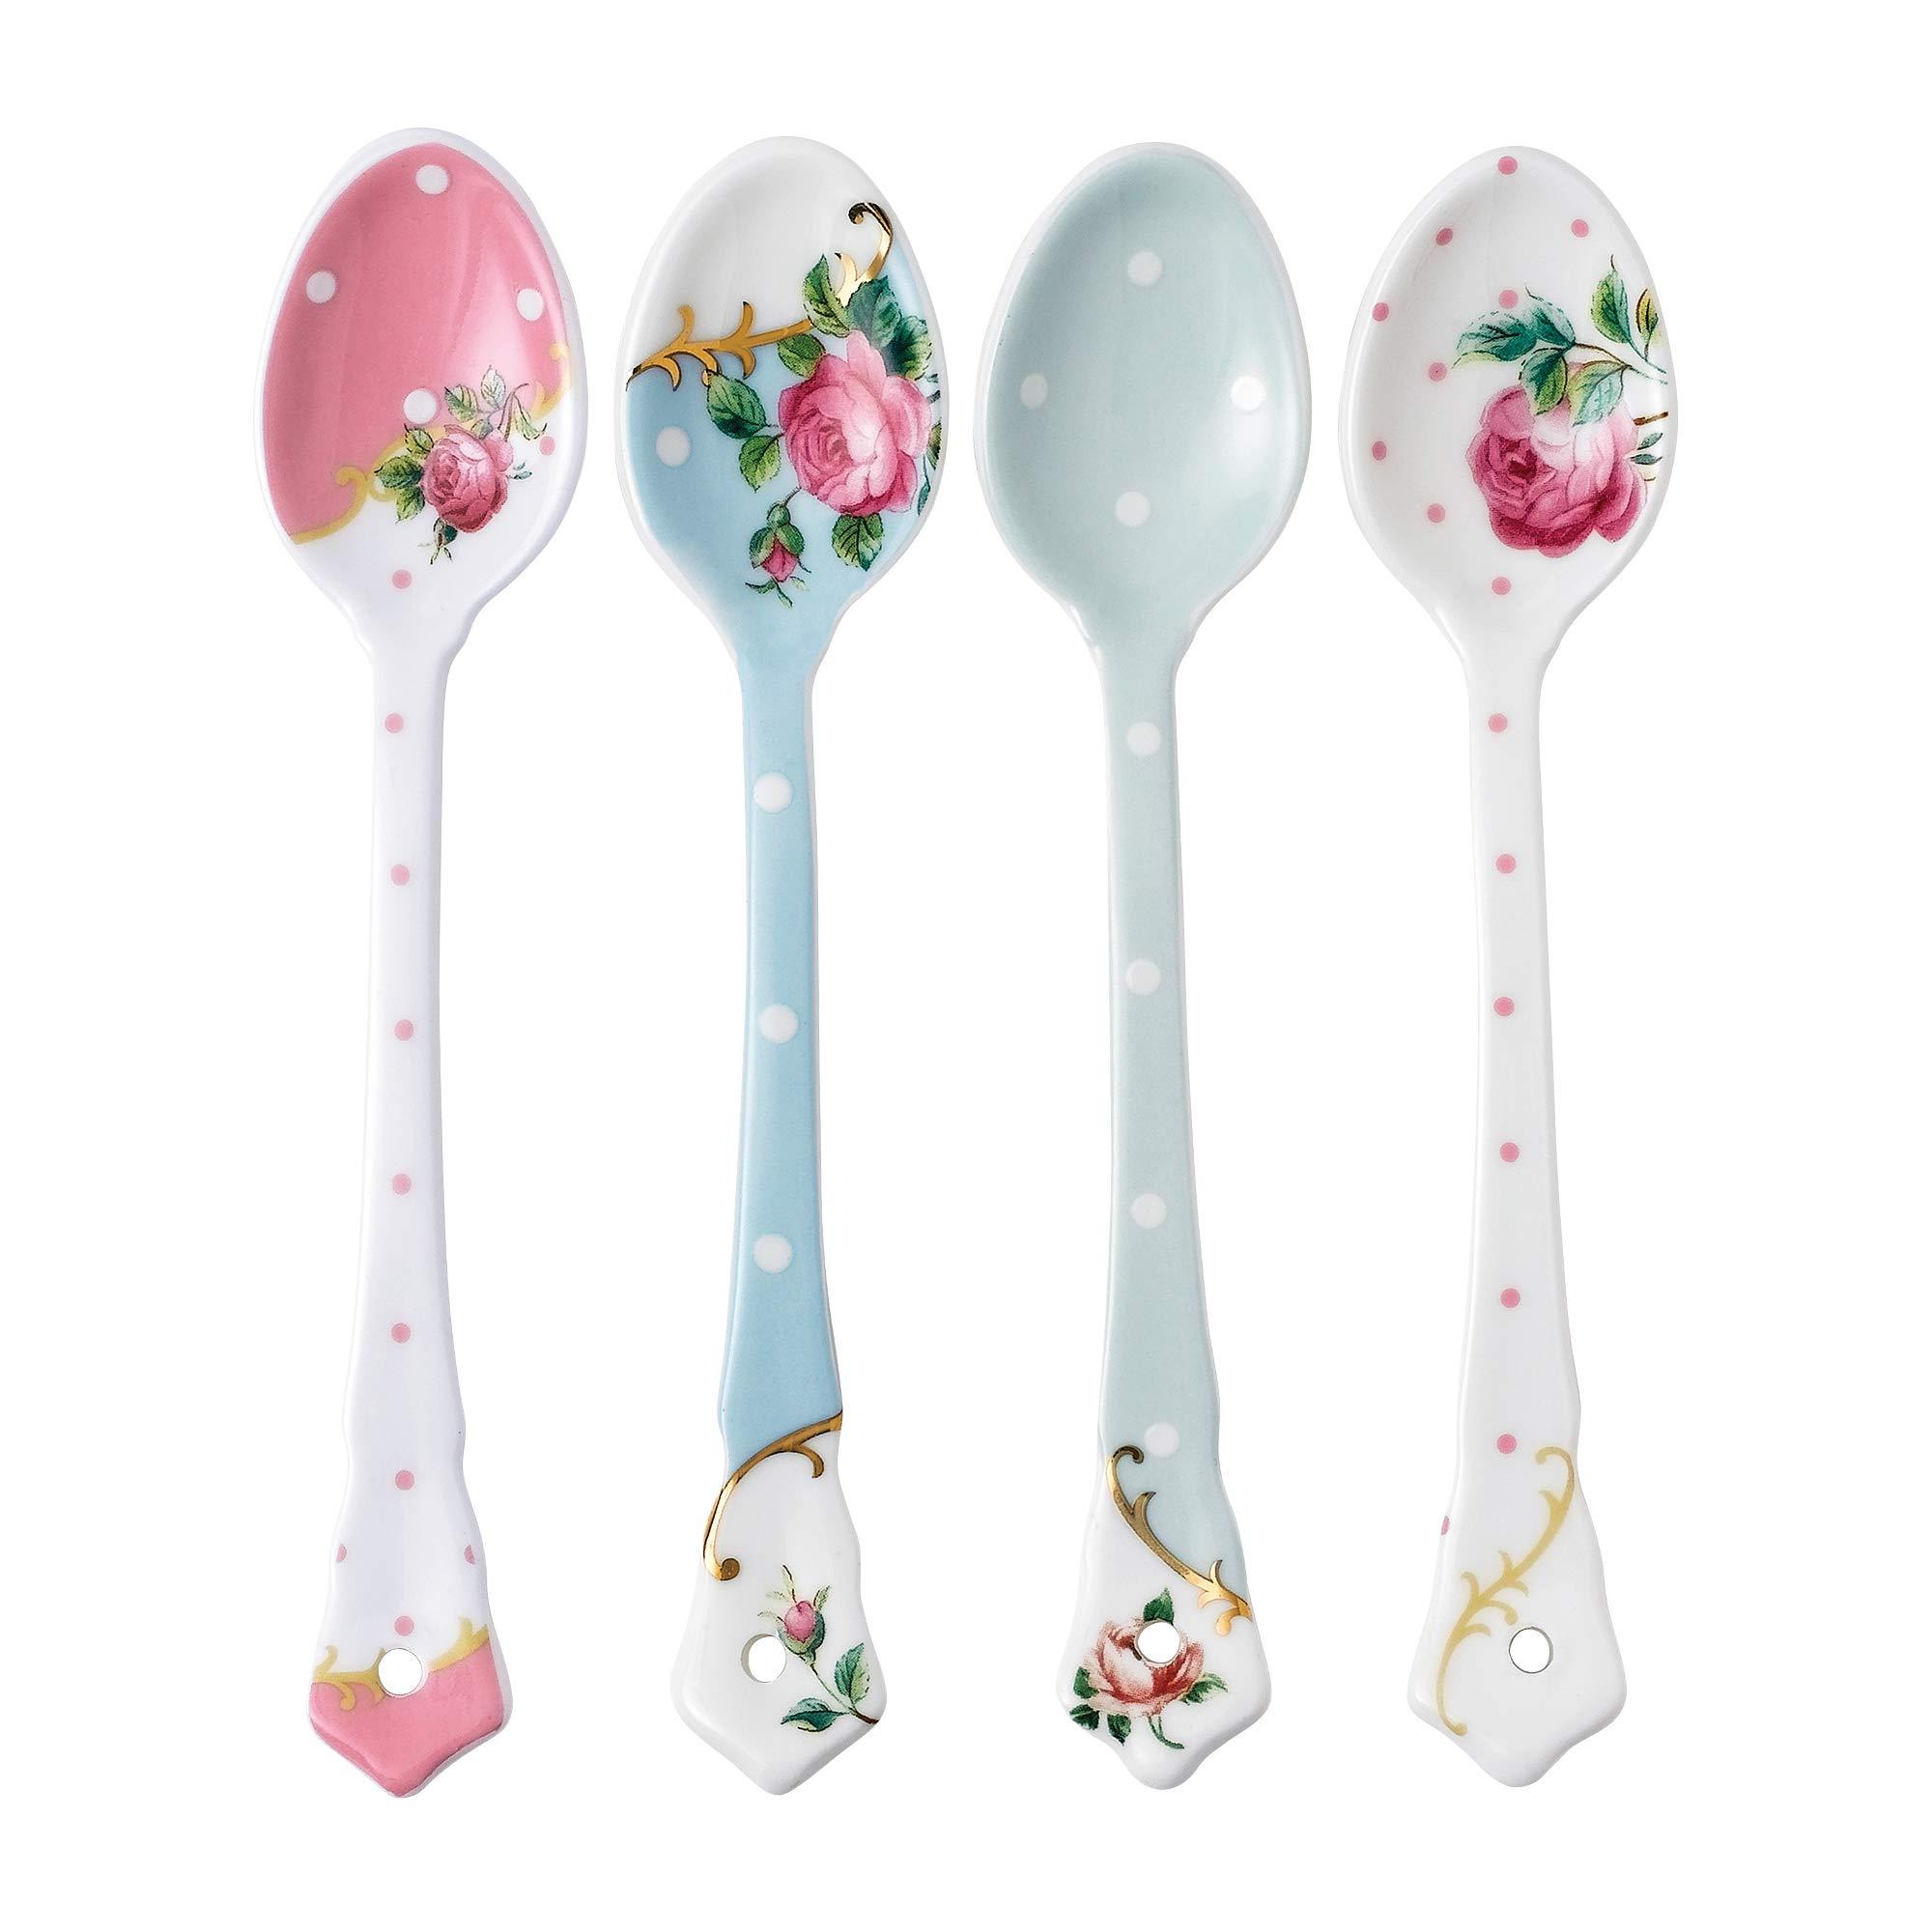 Royal Albert Set of 4 Mixed Ceramic Spoons by Royal Albert